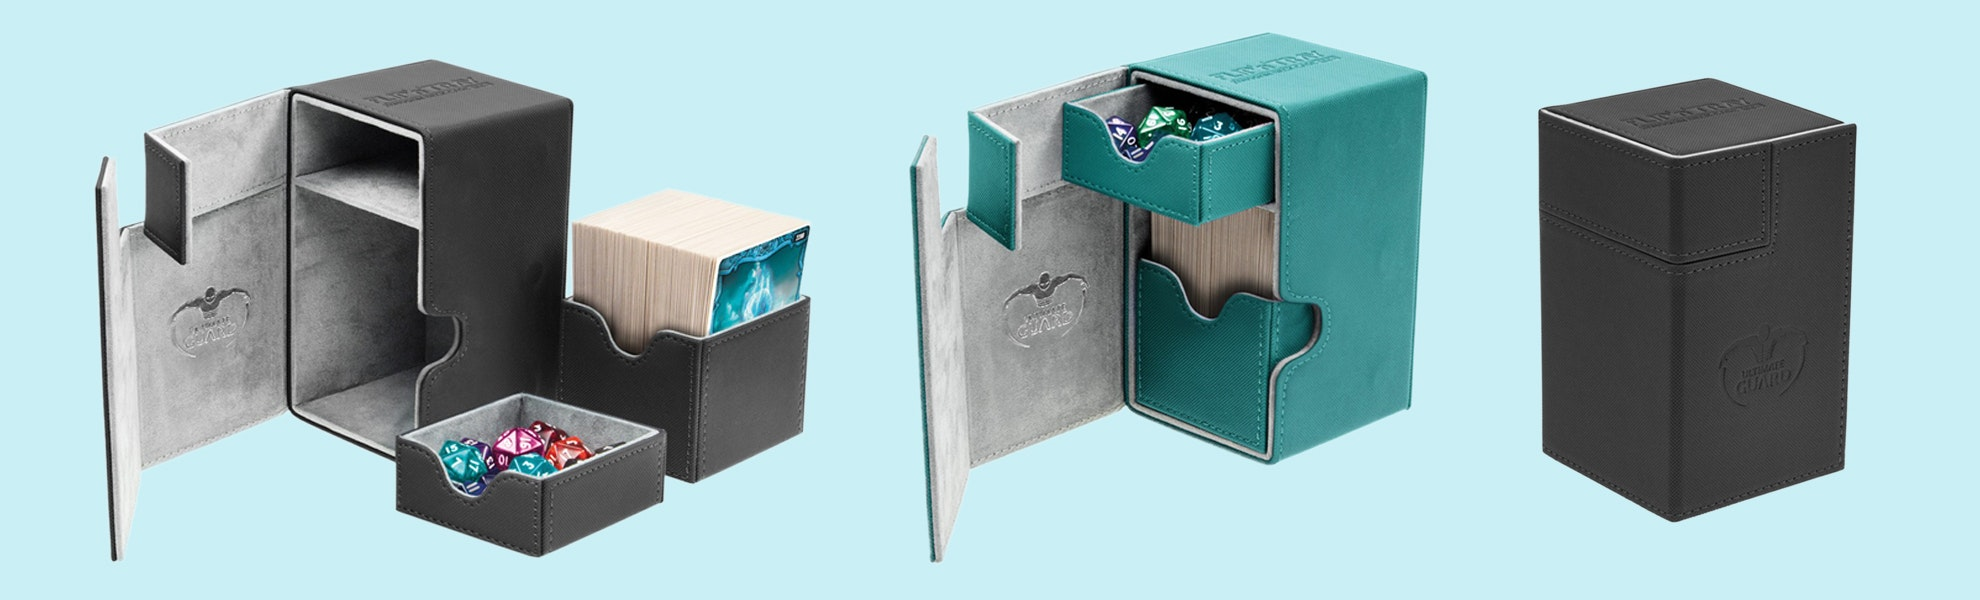 UG XenoSkin Flip´n´Tray Standard Deck Case (2-Pack)